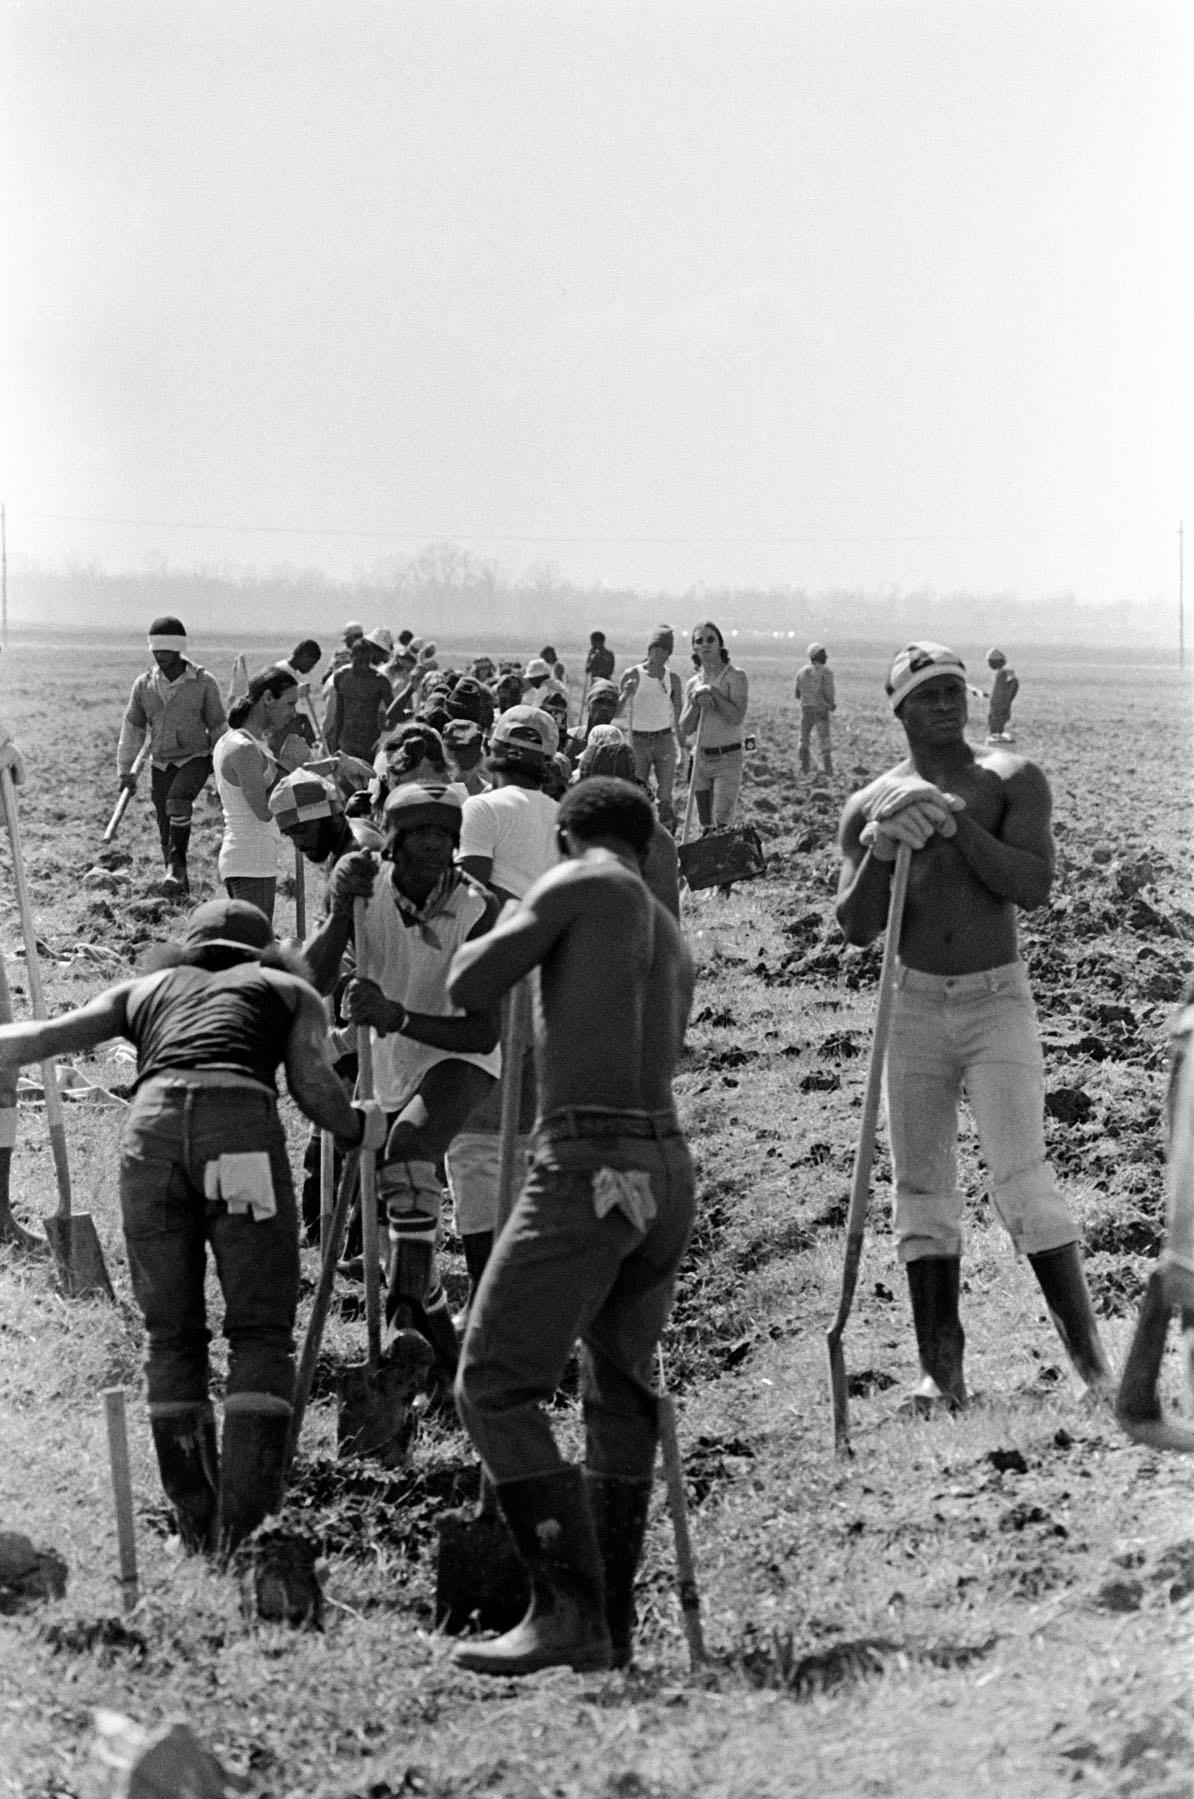 Keith Calhoun. FIELD WORK, ANGOLA STATE PENITENTIARY, 1980.